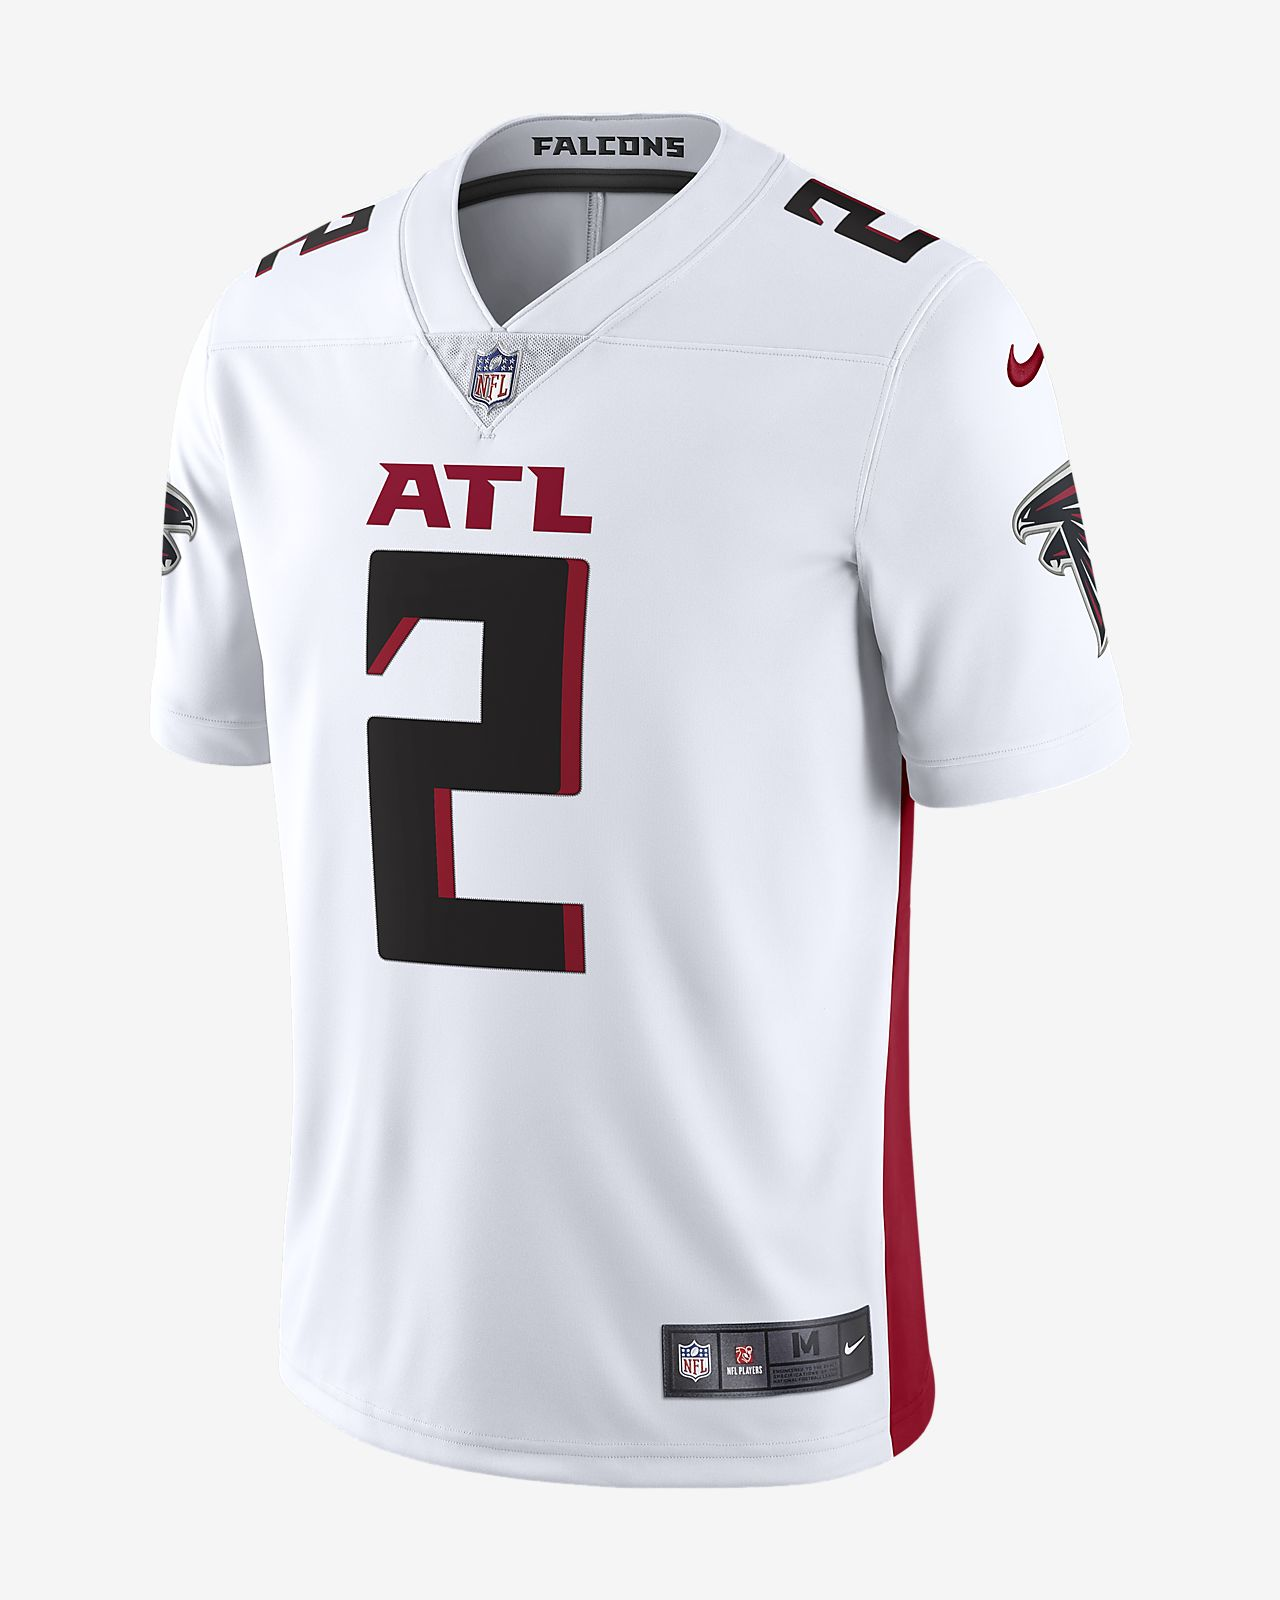 Camiseta de fútbol americano Limited Vapor Untouchable para hombre NFL  Atlanta Falcons (Matt Ryan)